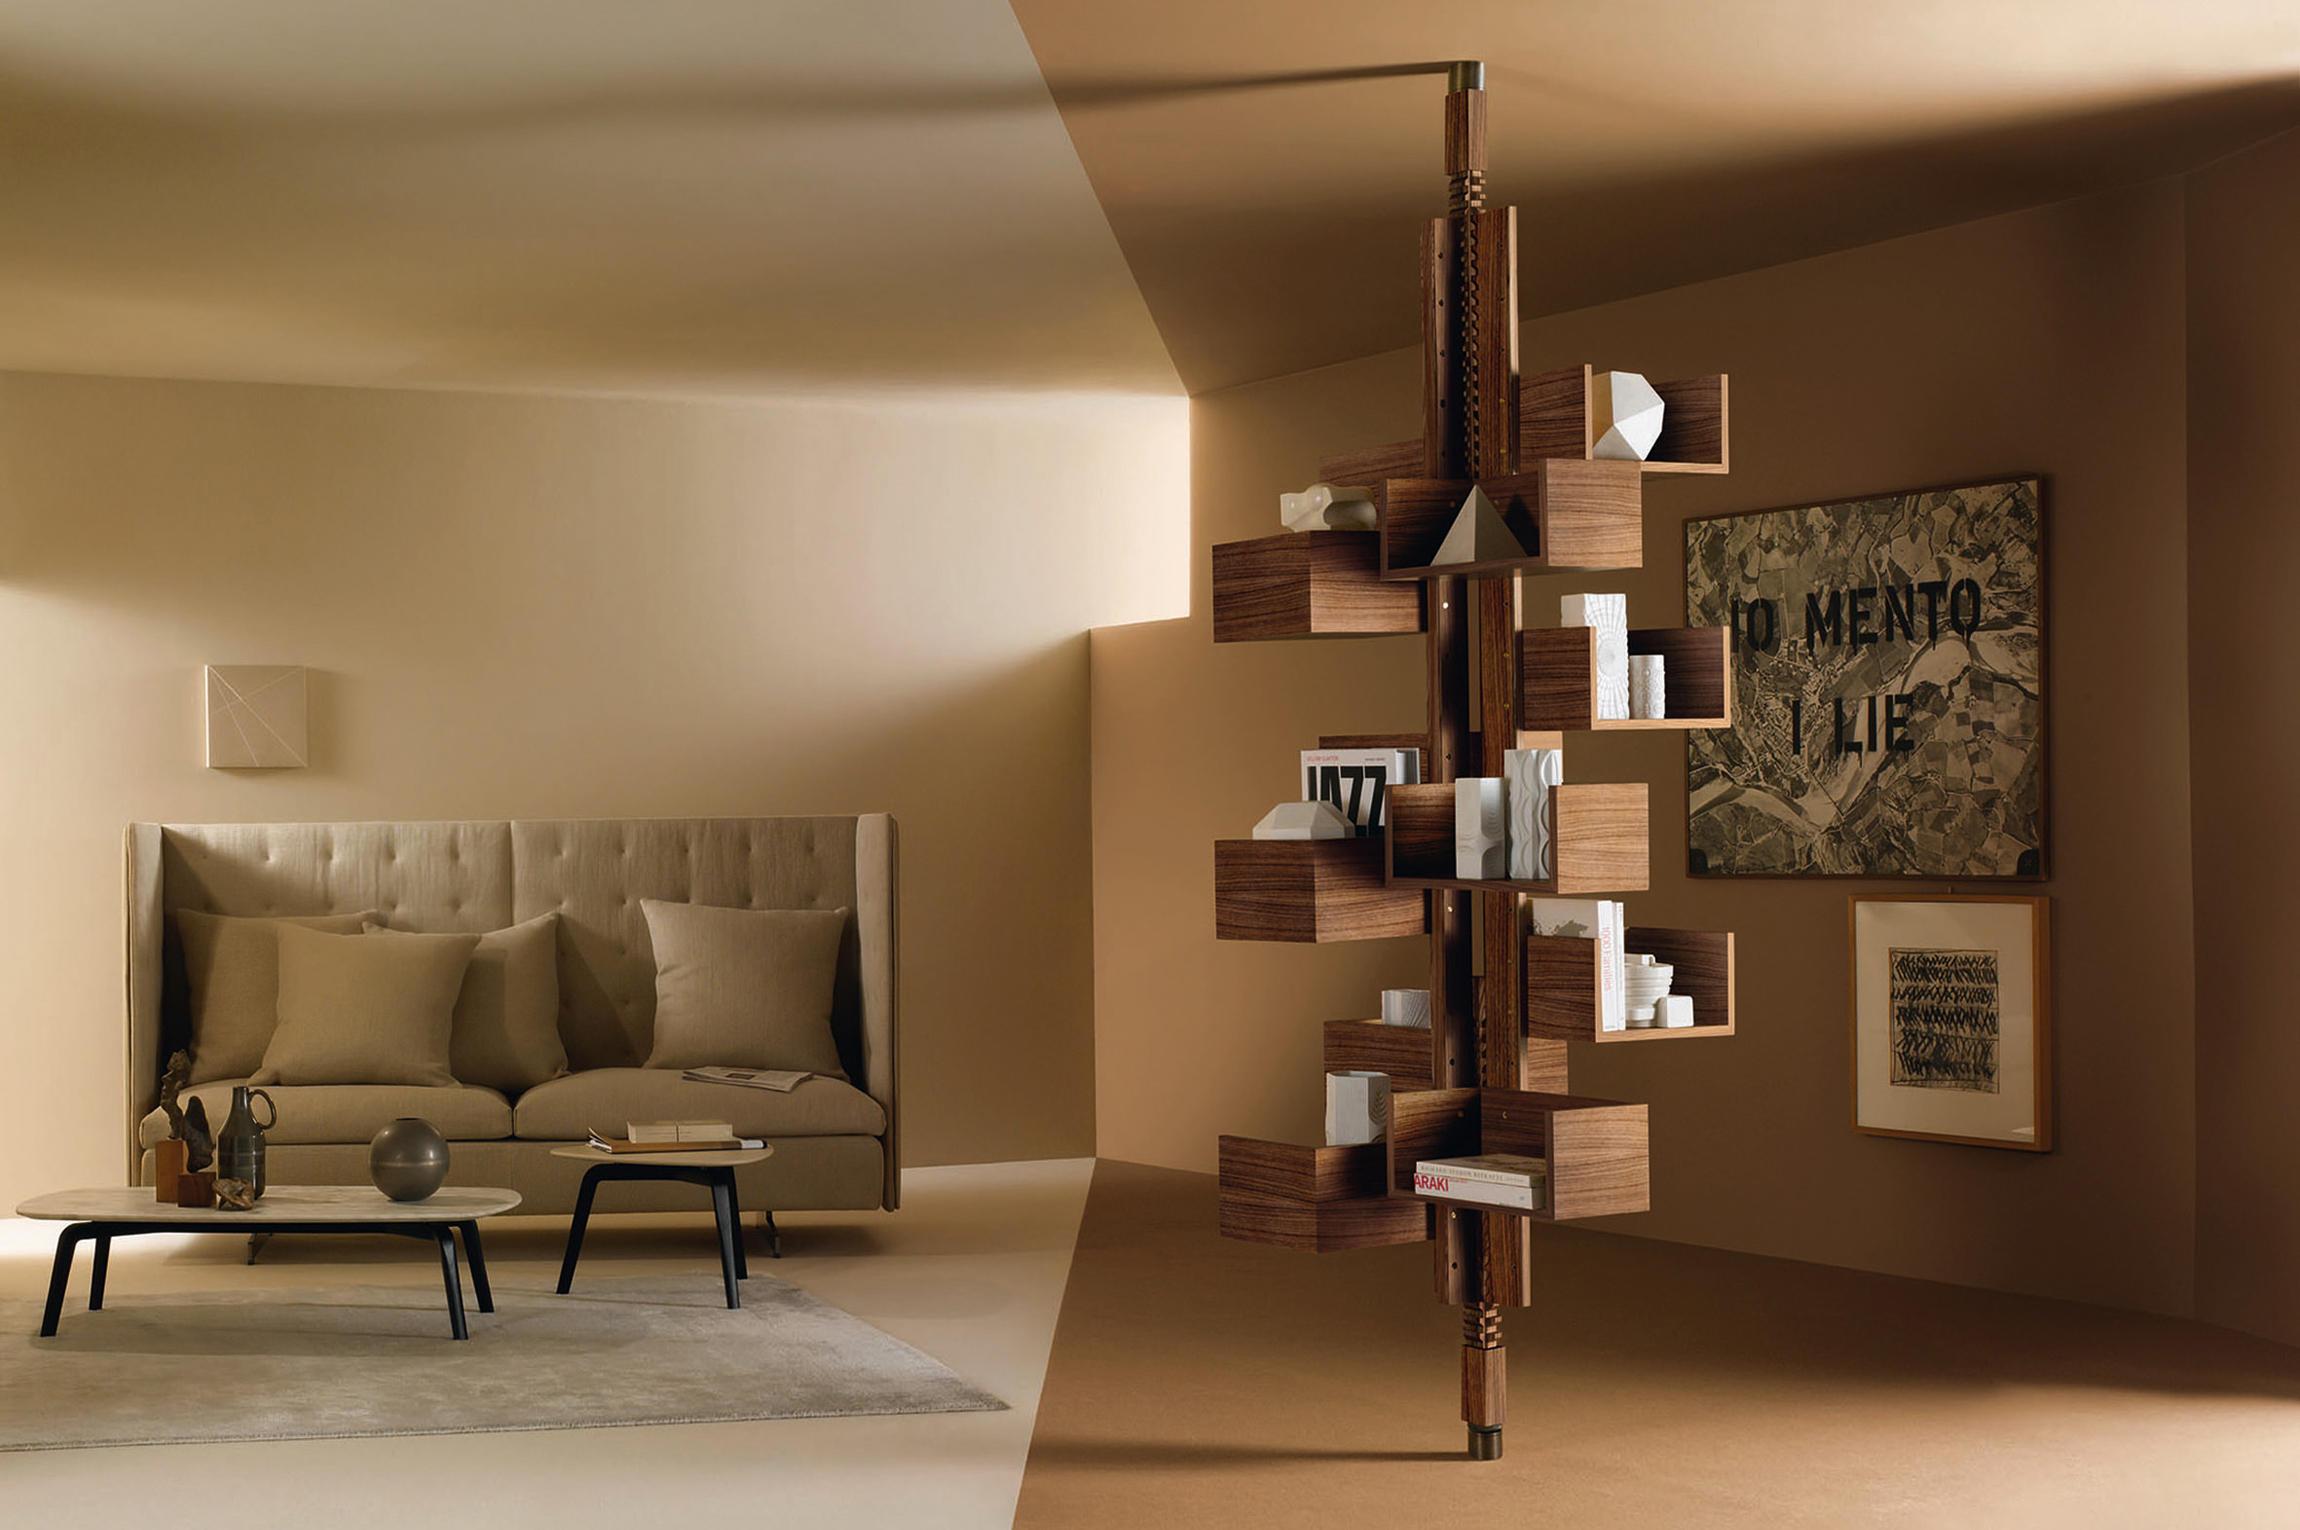 Poltrona frau masters of leathership genuine designer